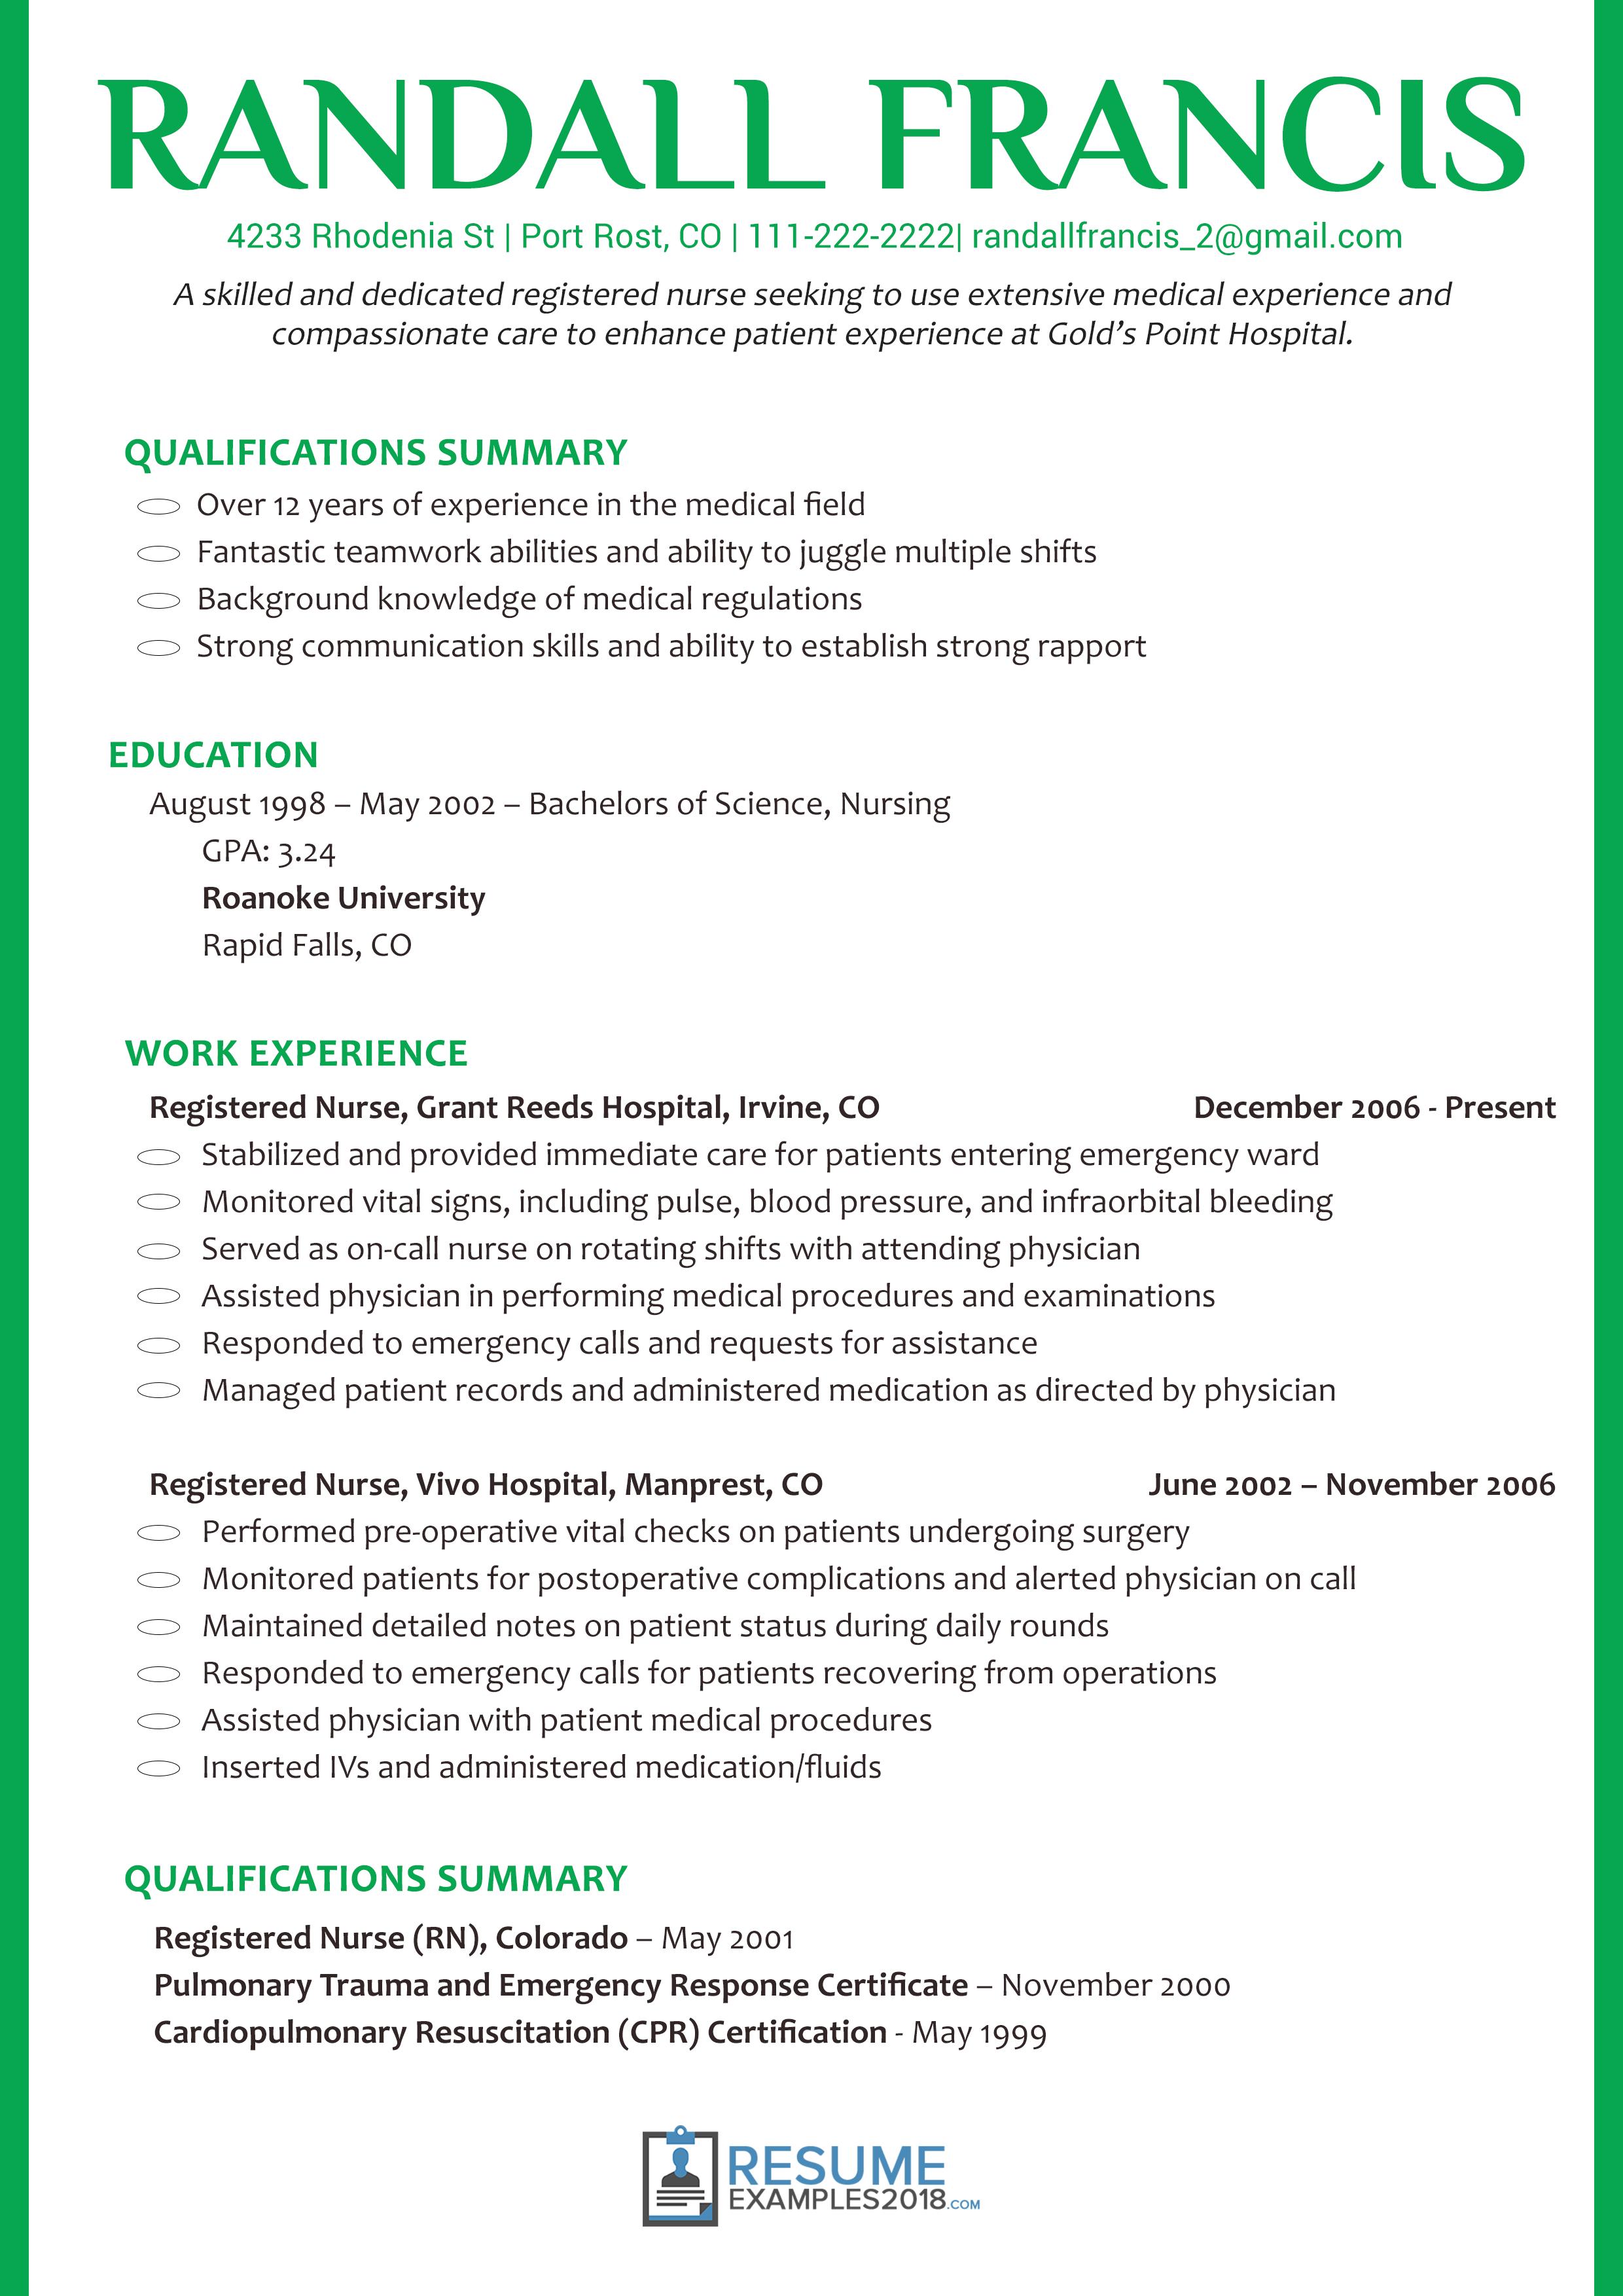 Basic Resume Examples 2018 48